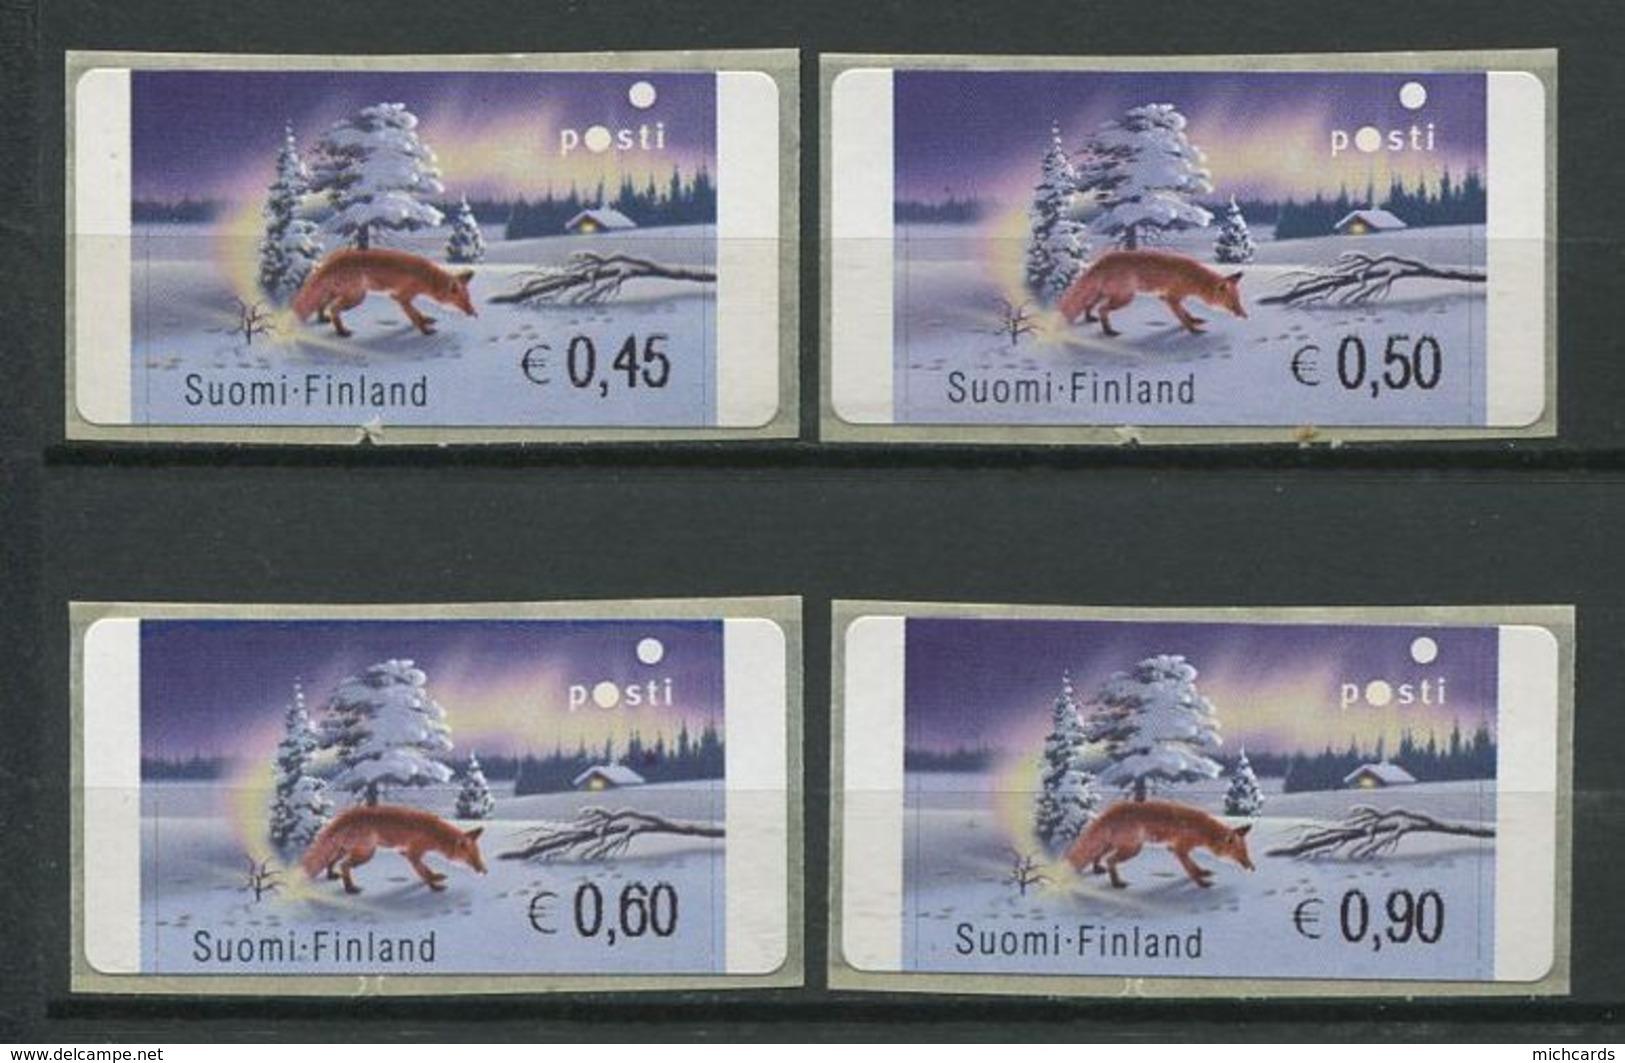 255 FINLANDE 2002 - Yvert 33 Distributeur Adhesif - Renard Neige - Neuf ** (MNH) Sans Trace De Charniere - Finland